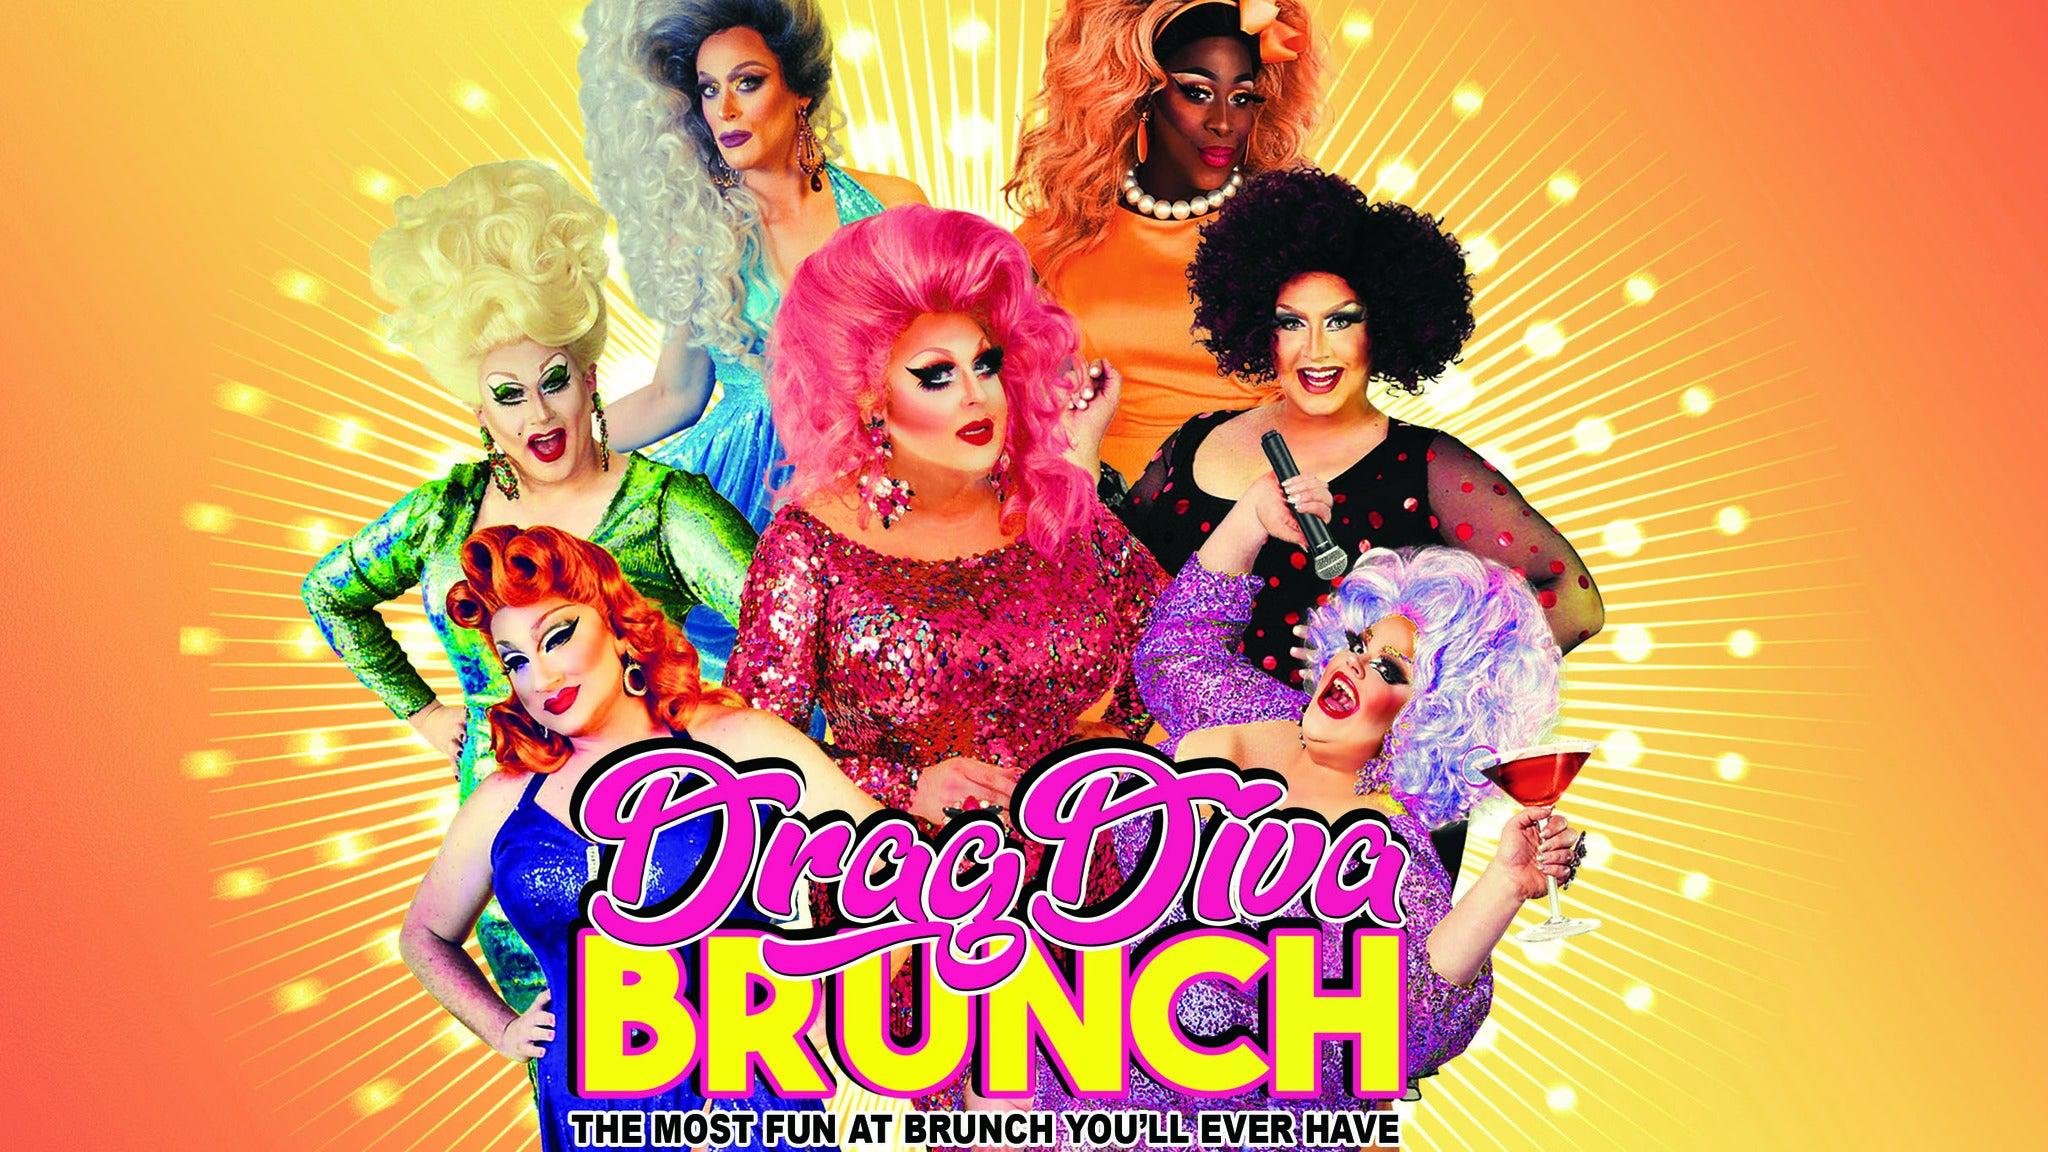 Drag Diva Brunch at The Queen